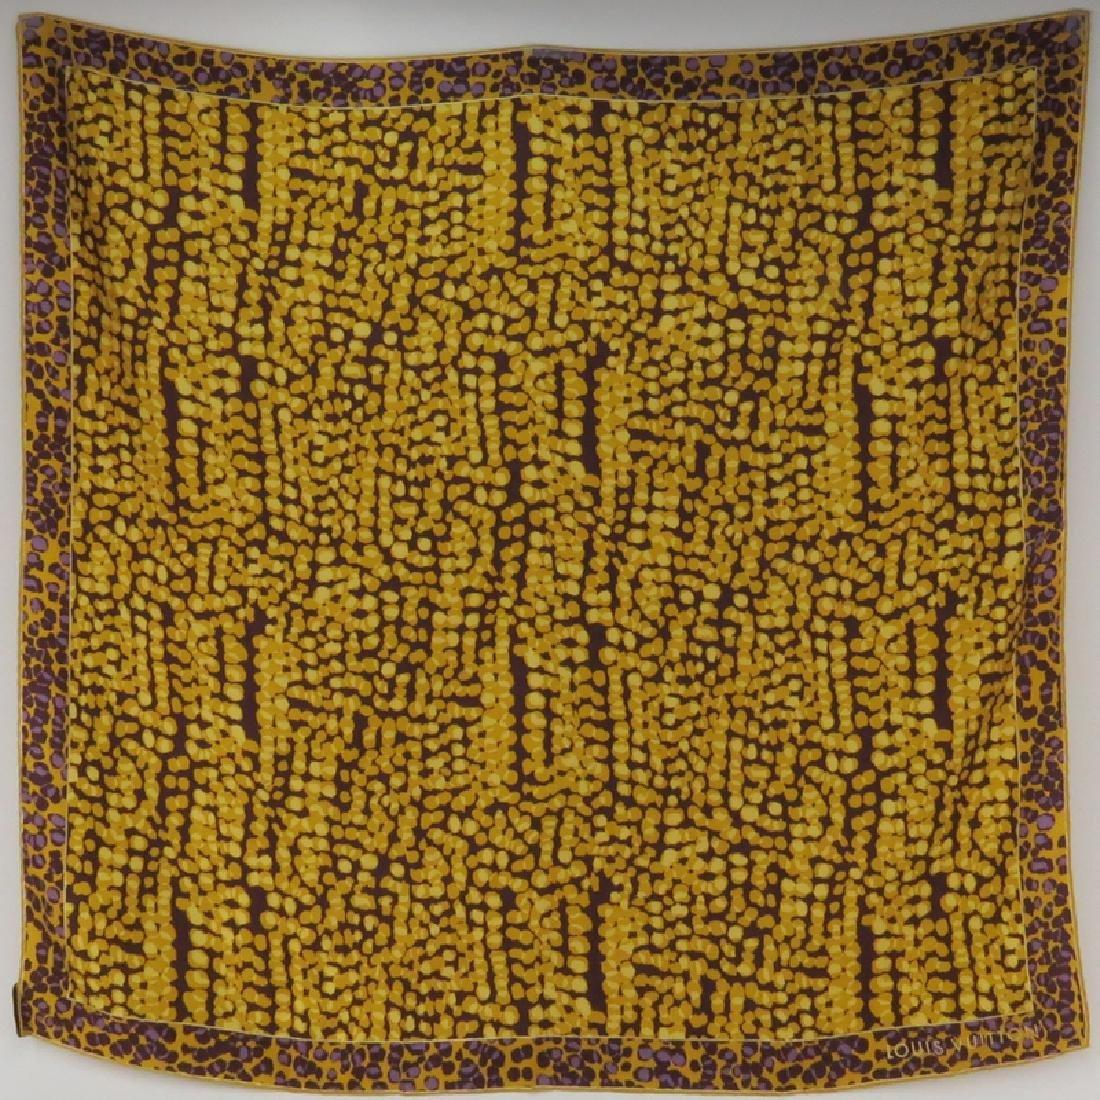 Louis Vuitton Silk Scarf, Gold, Yellow, Purple Print.